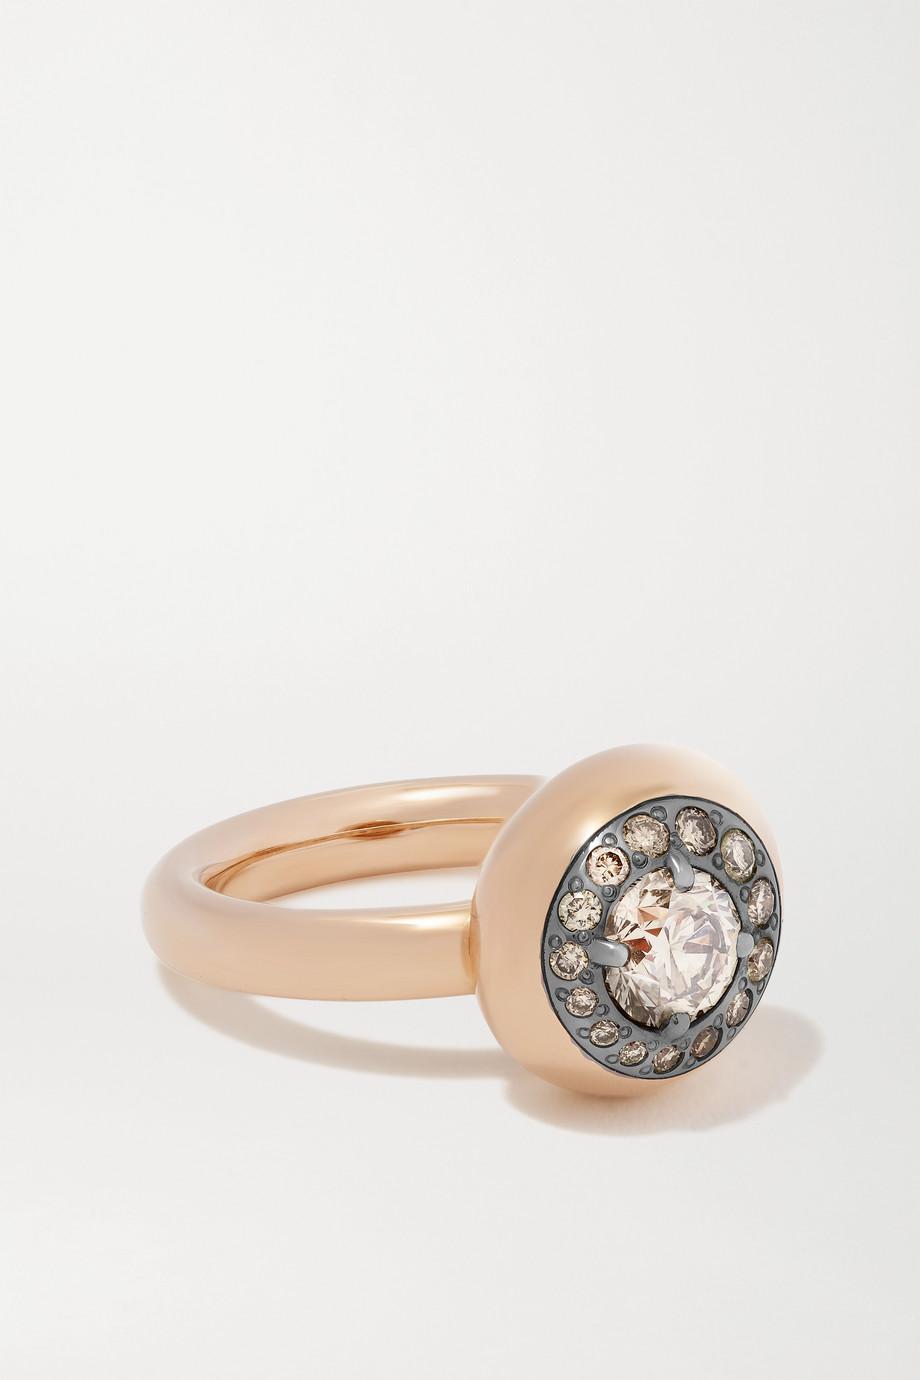 Pomellato Nuvola Ring aus 18 Karat Roségold mit Diamanten